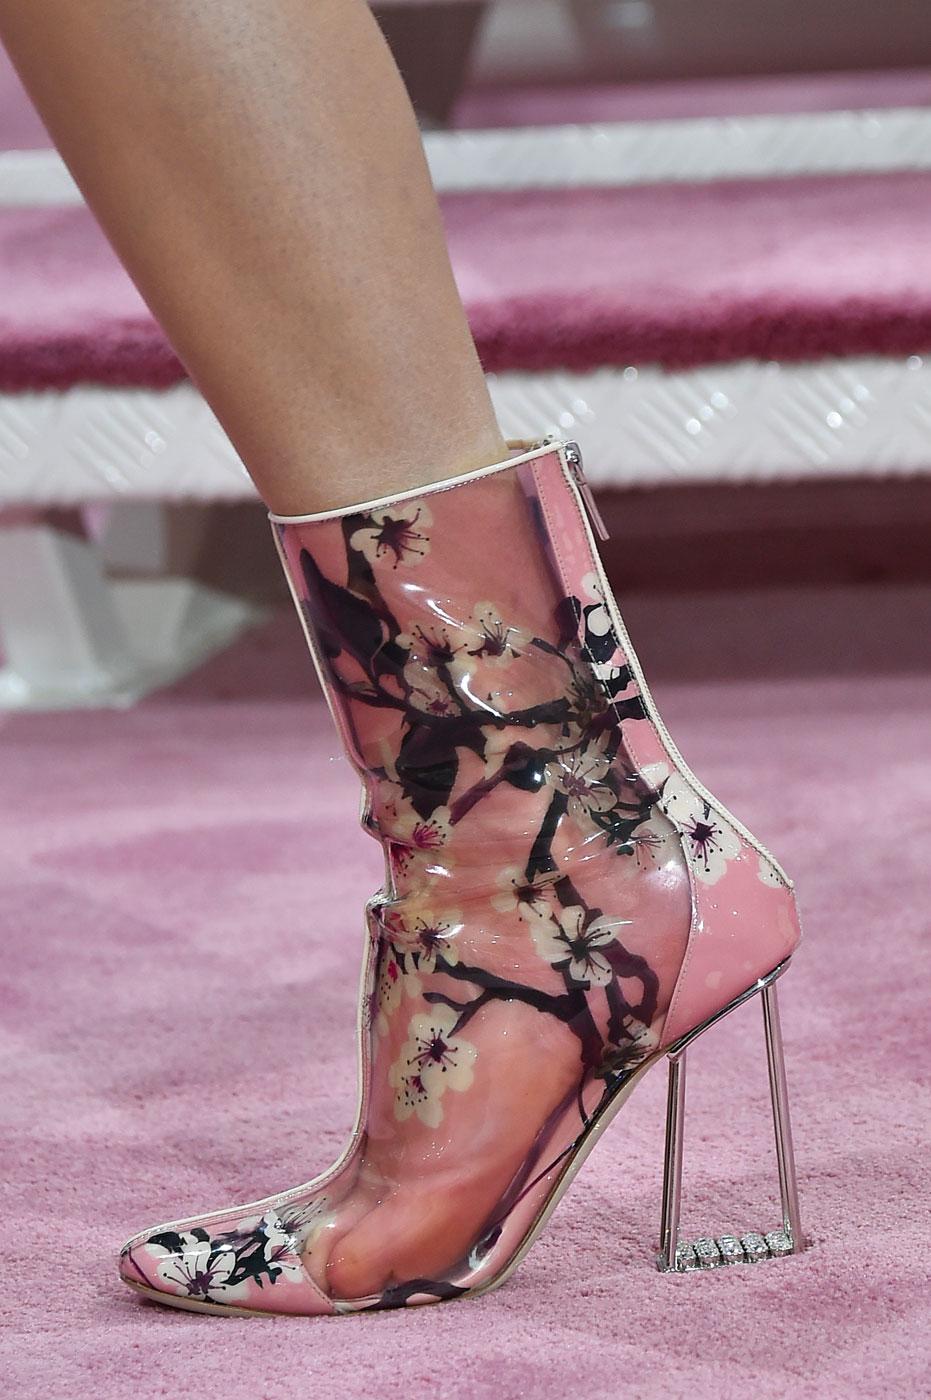 Christian-Dior-fashion-runway-show-close-ups-haute-couture-paris-spring-summer-2015-the-impression-060